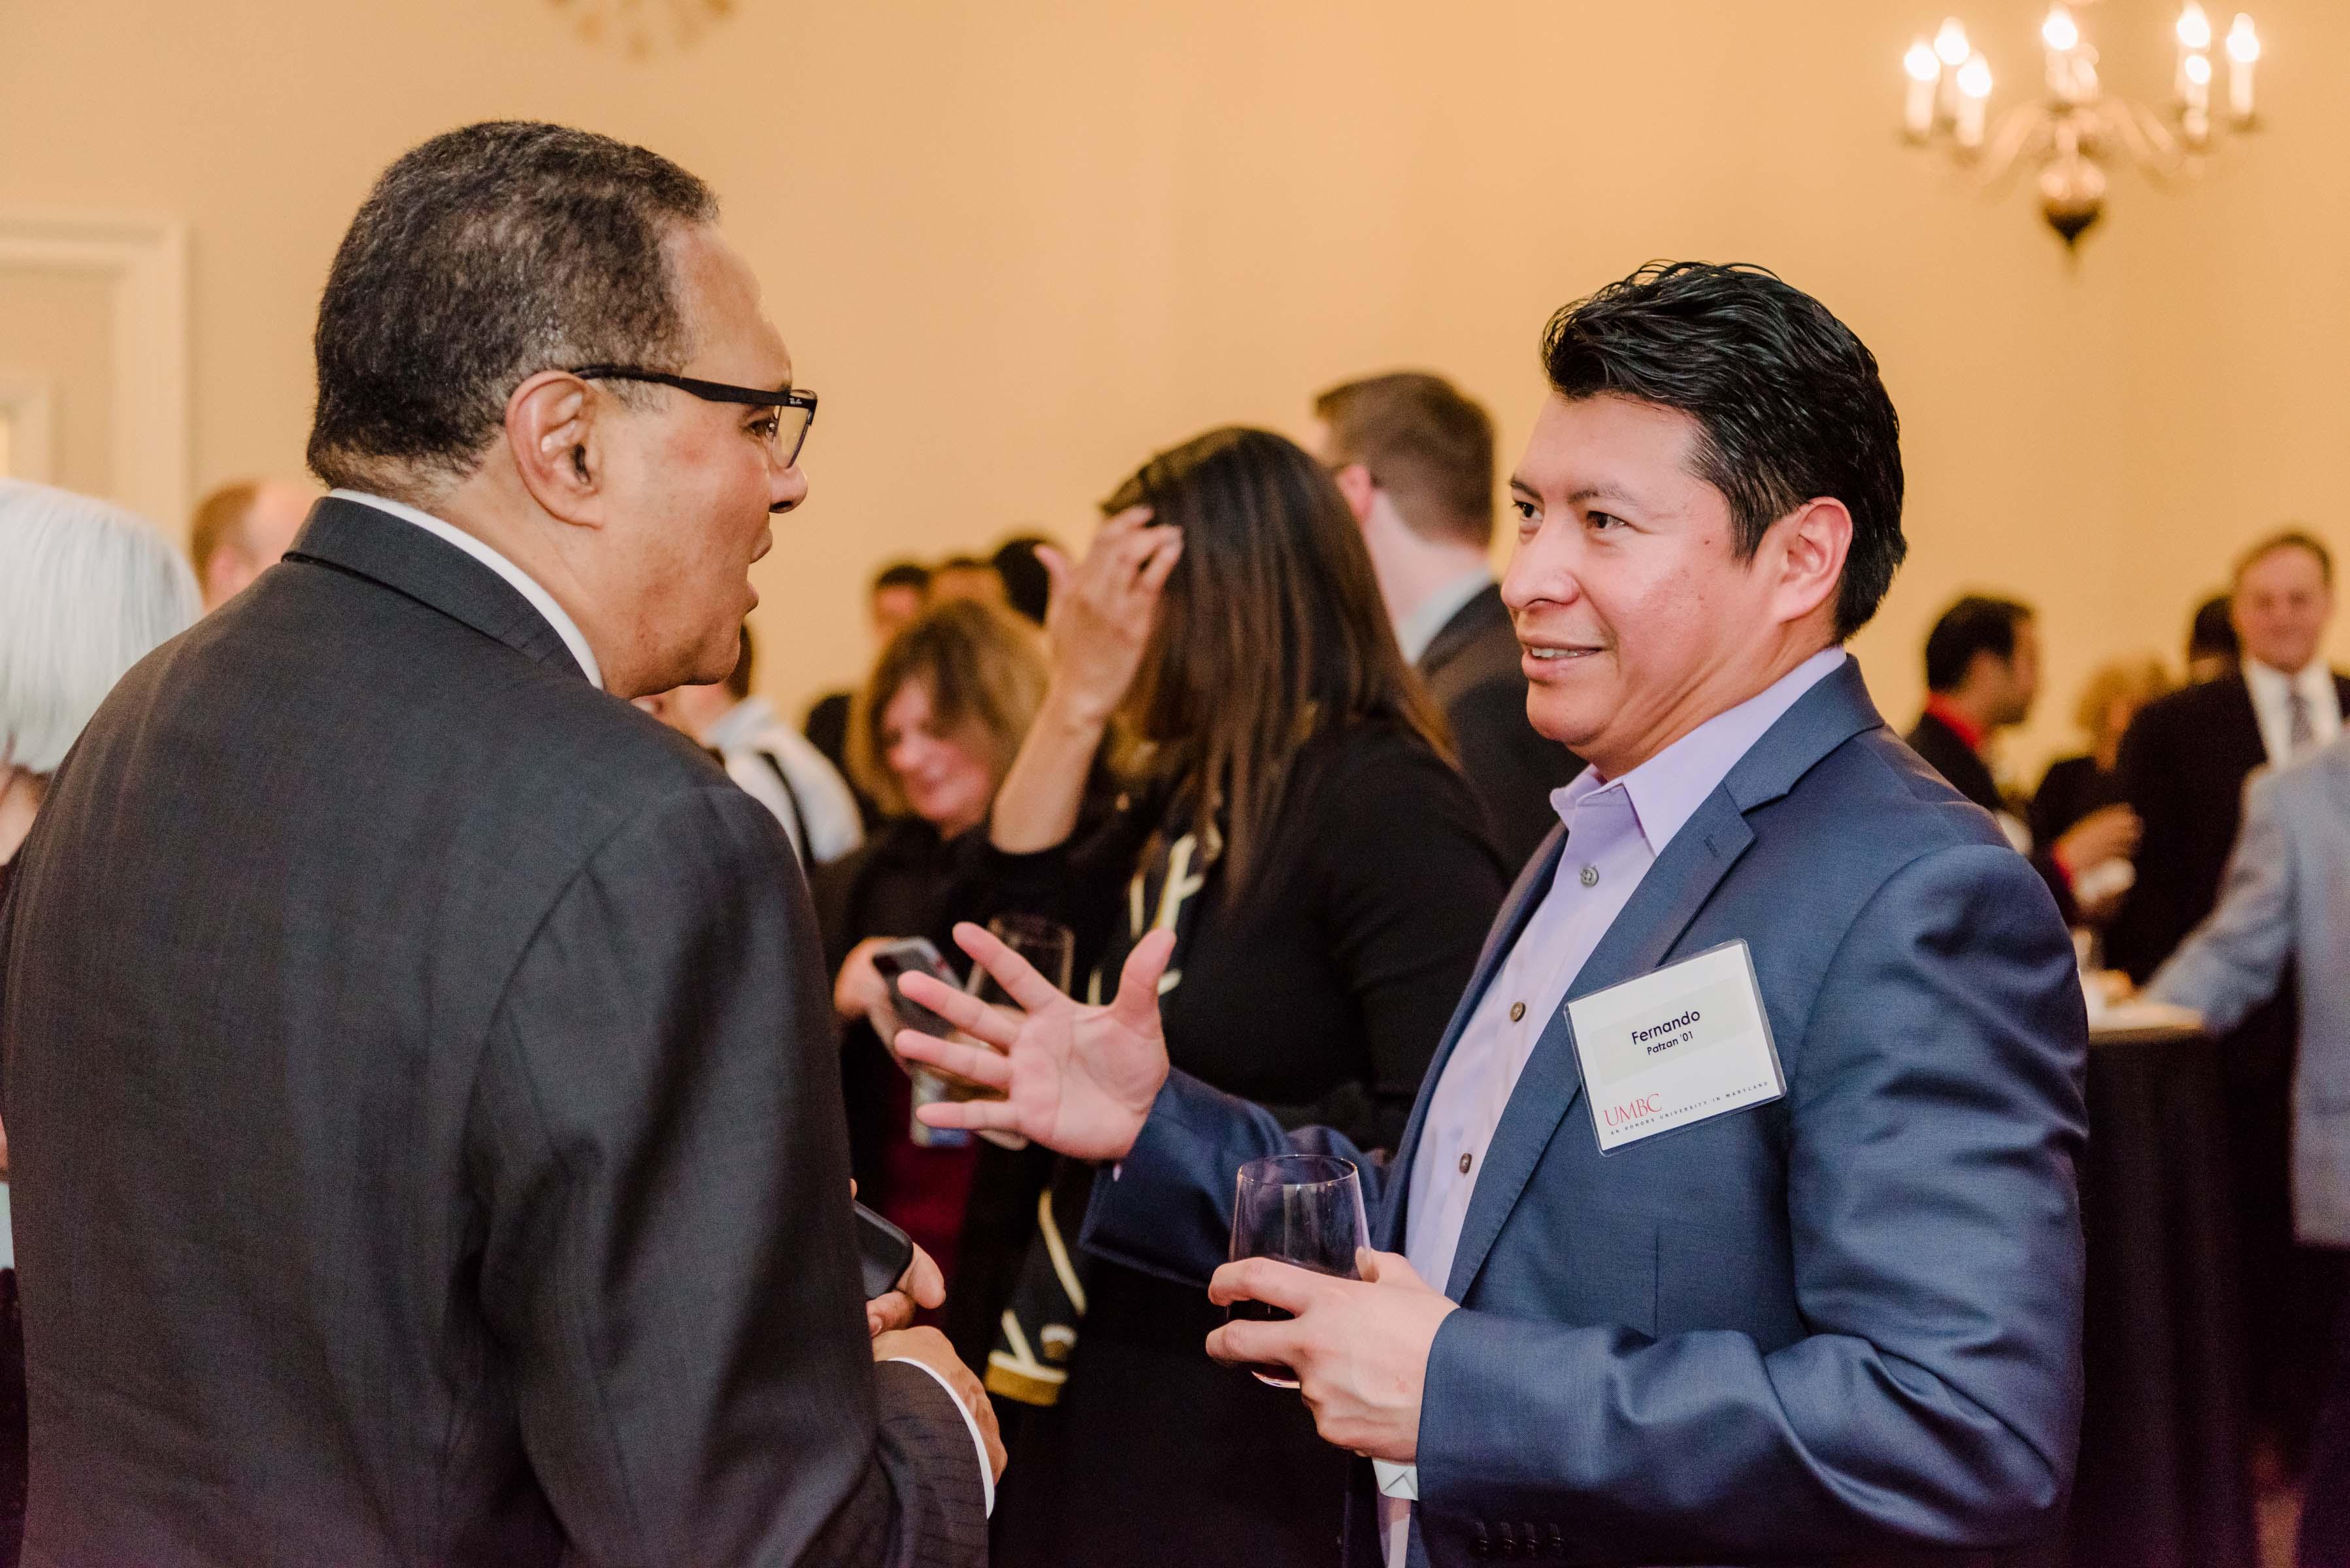 Hrabowski talks to other alumni at Annapolis Alumni reception